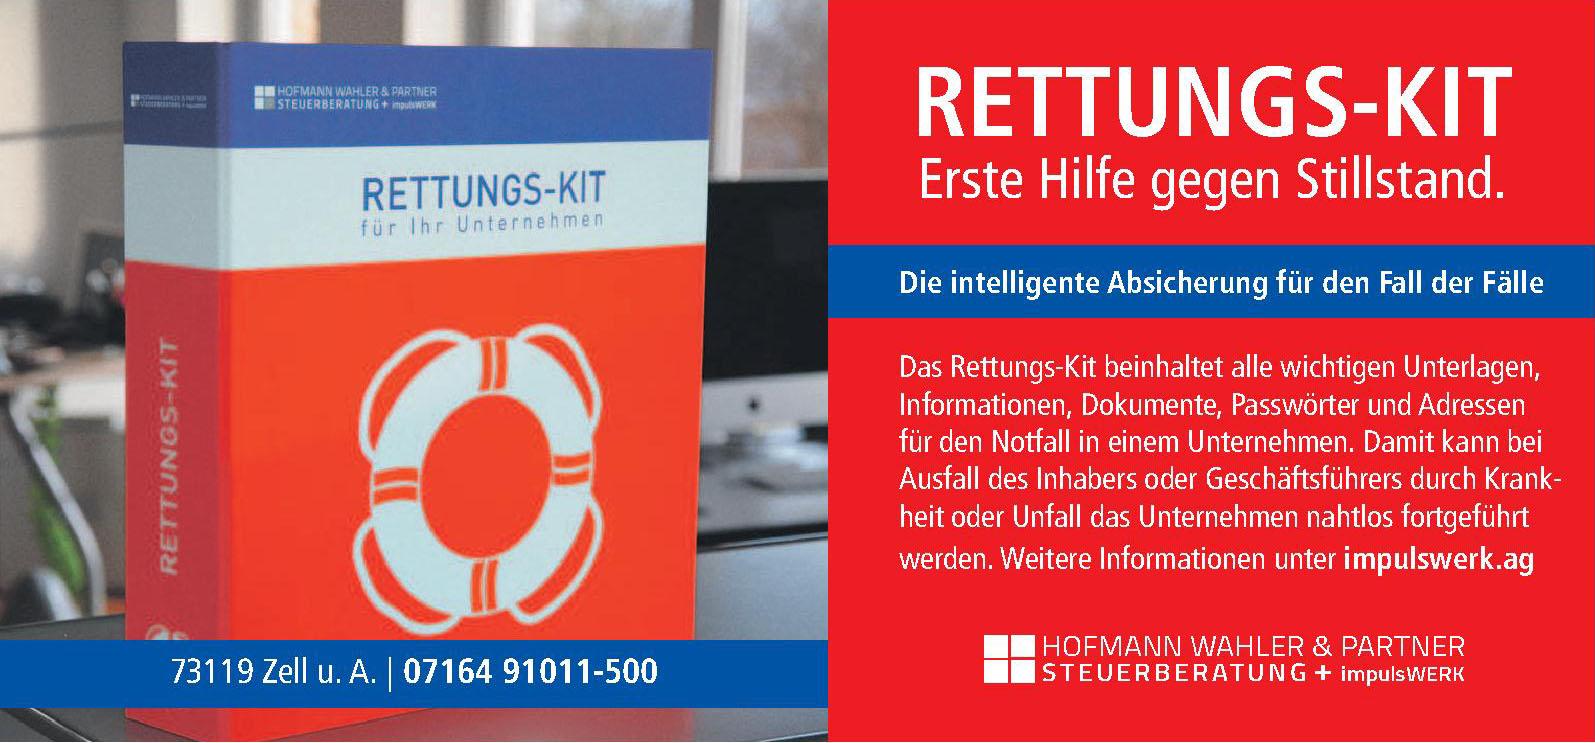 Hofmann Wahler & Partner Steuerberatung